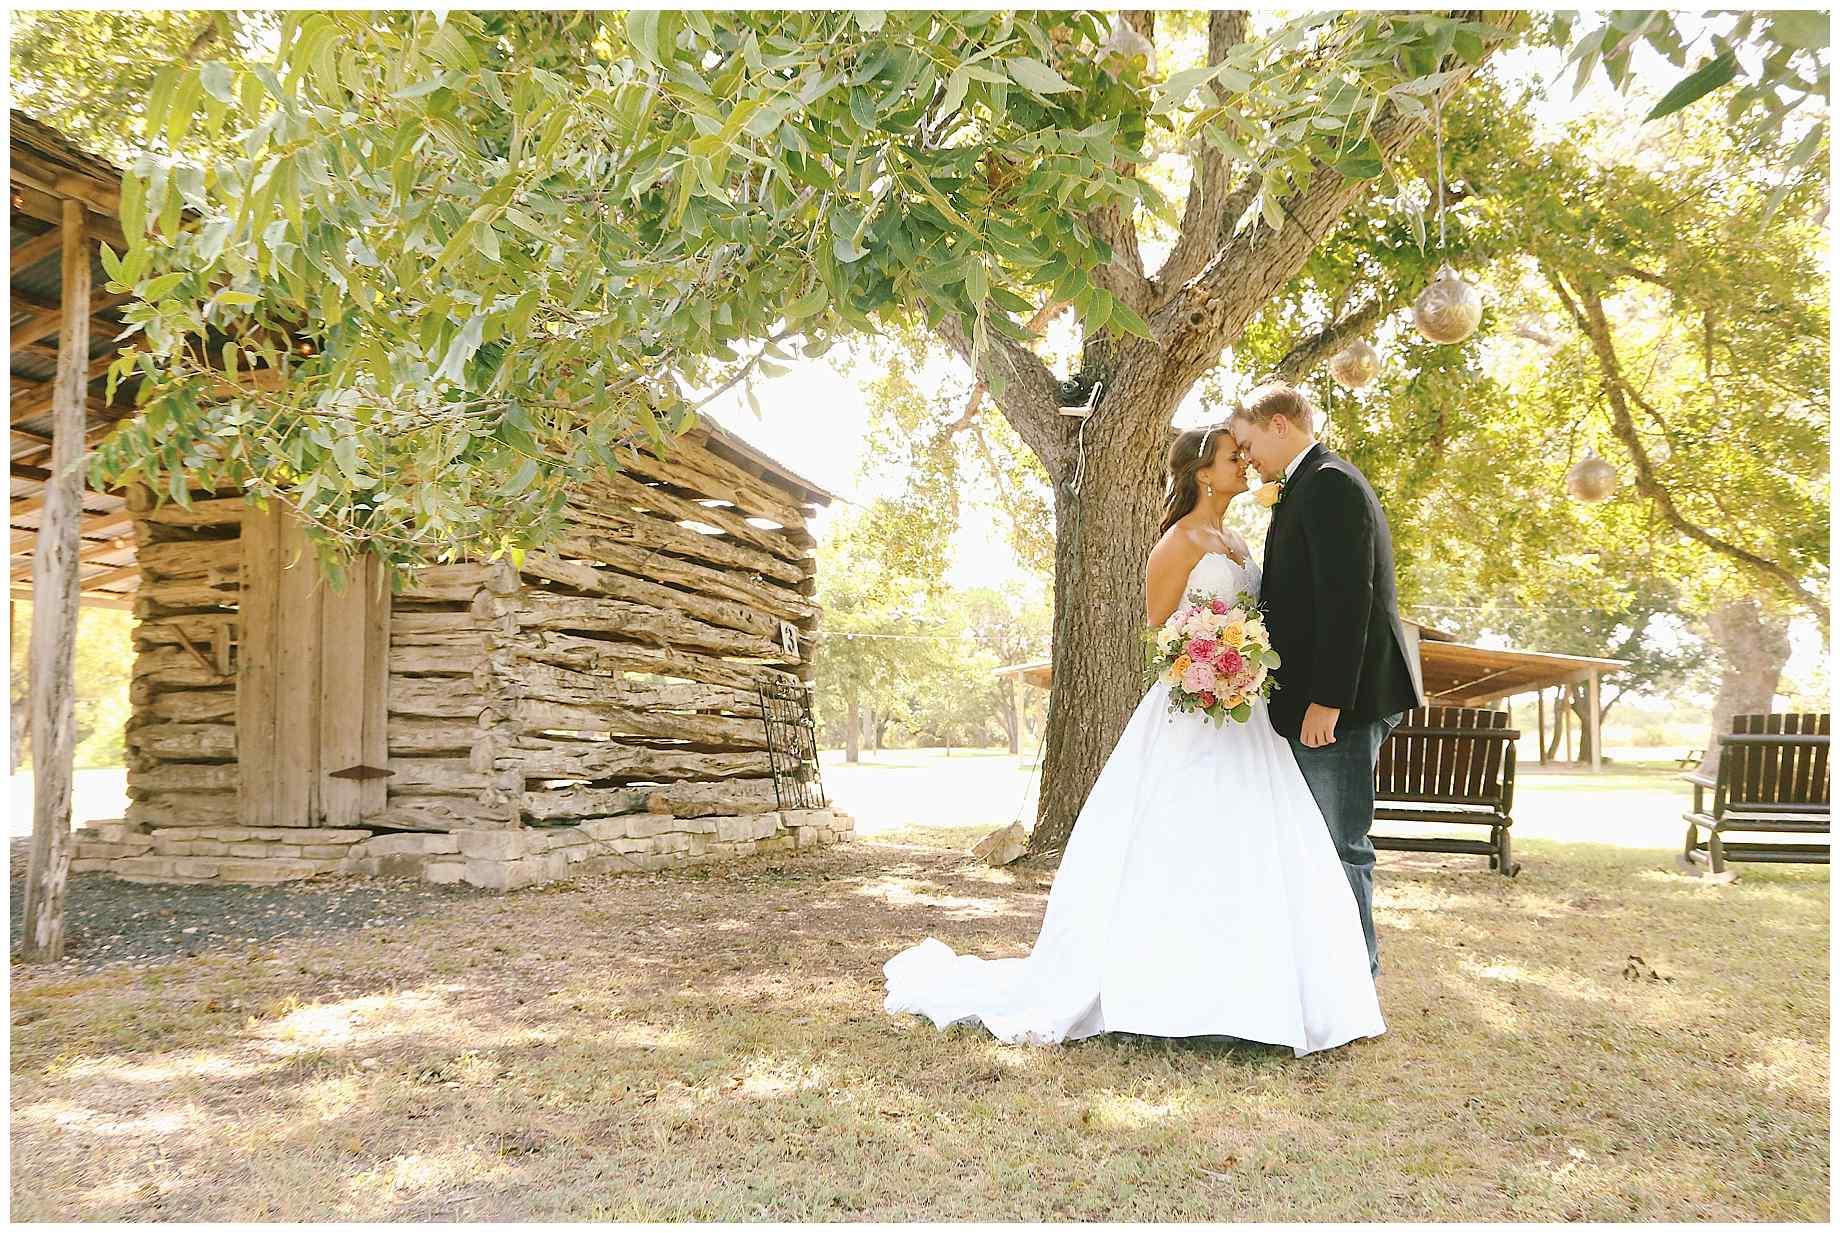 pecan-springs-ranch-austin-tx-wedding-006